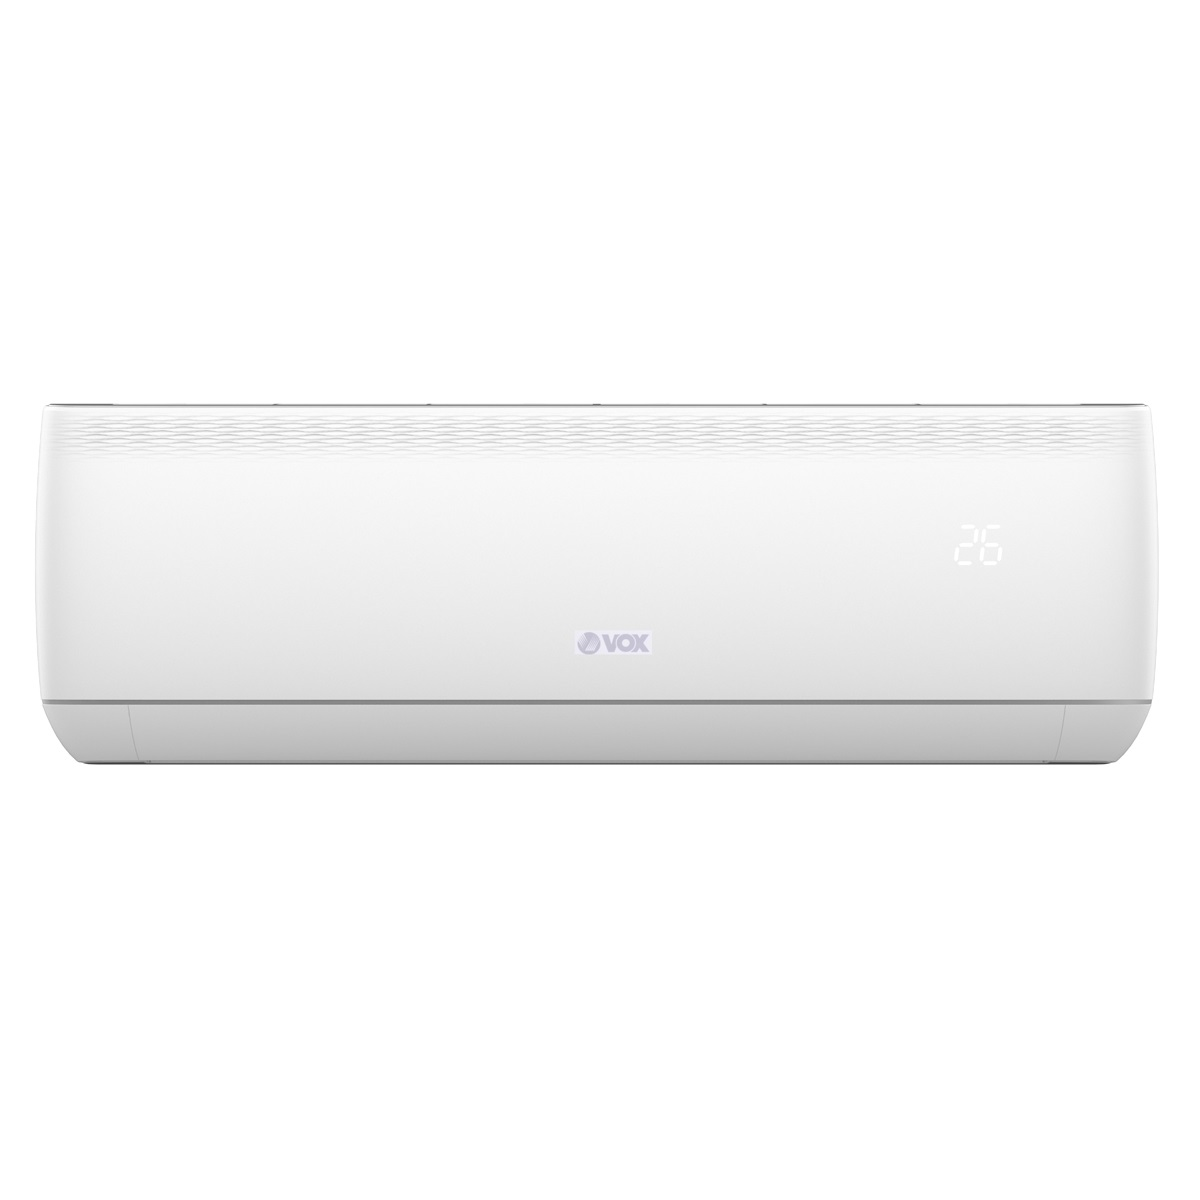 VOX klima uređaj inverter IVA1-12JR - Inelektronik